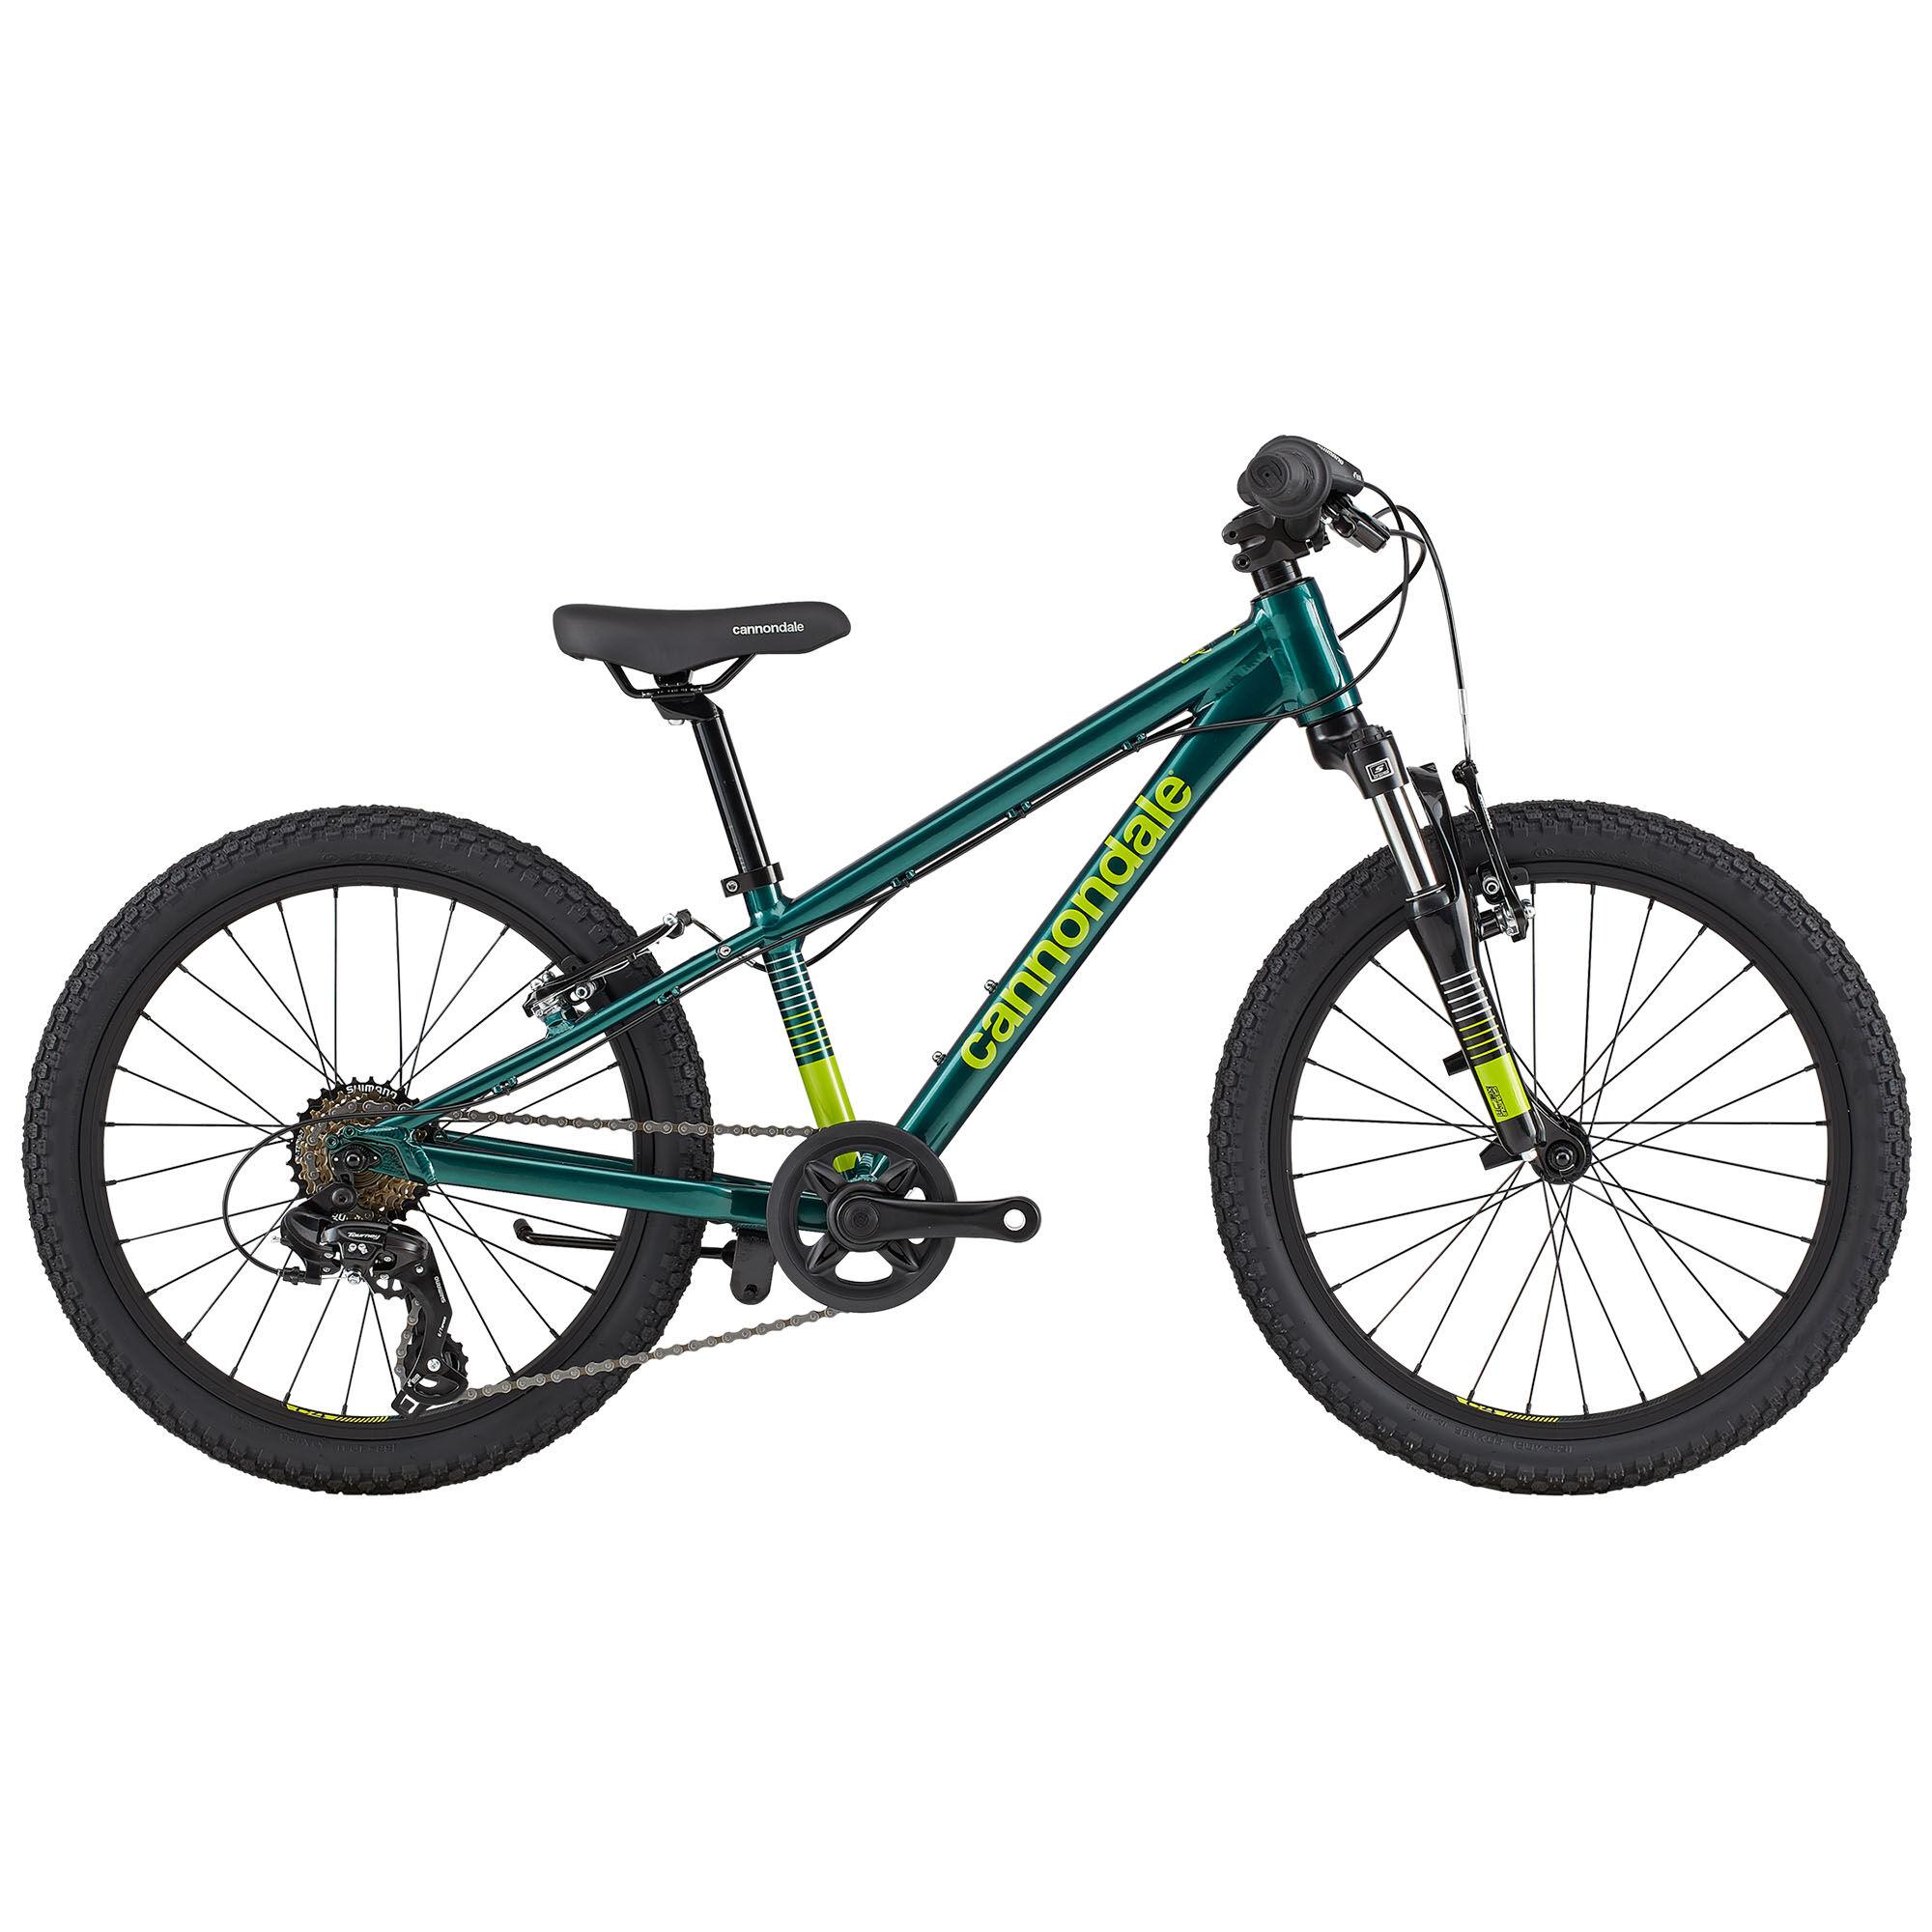 Cannondale Kids' Trail 20 Boys Bike '20  - Emerald - Size: 20